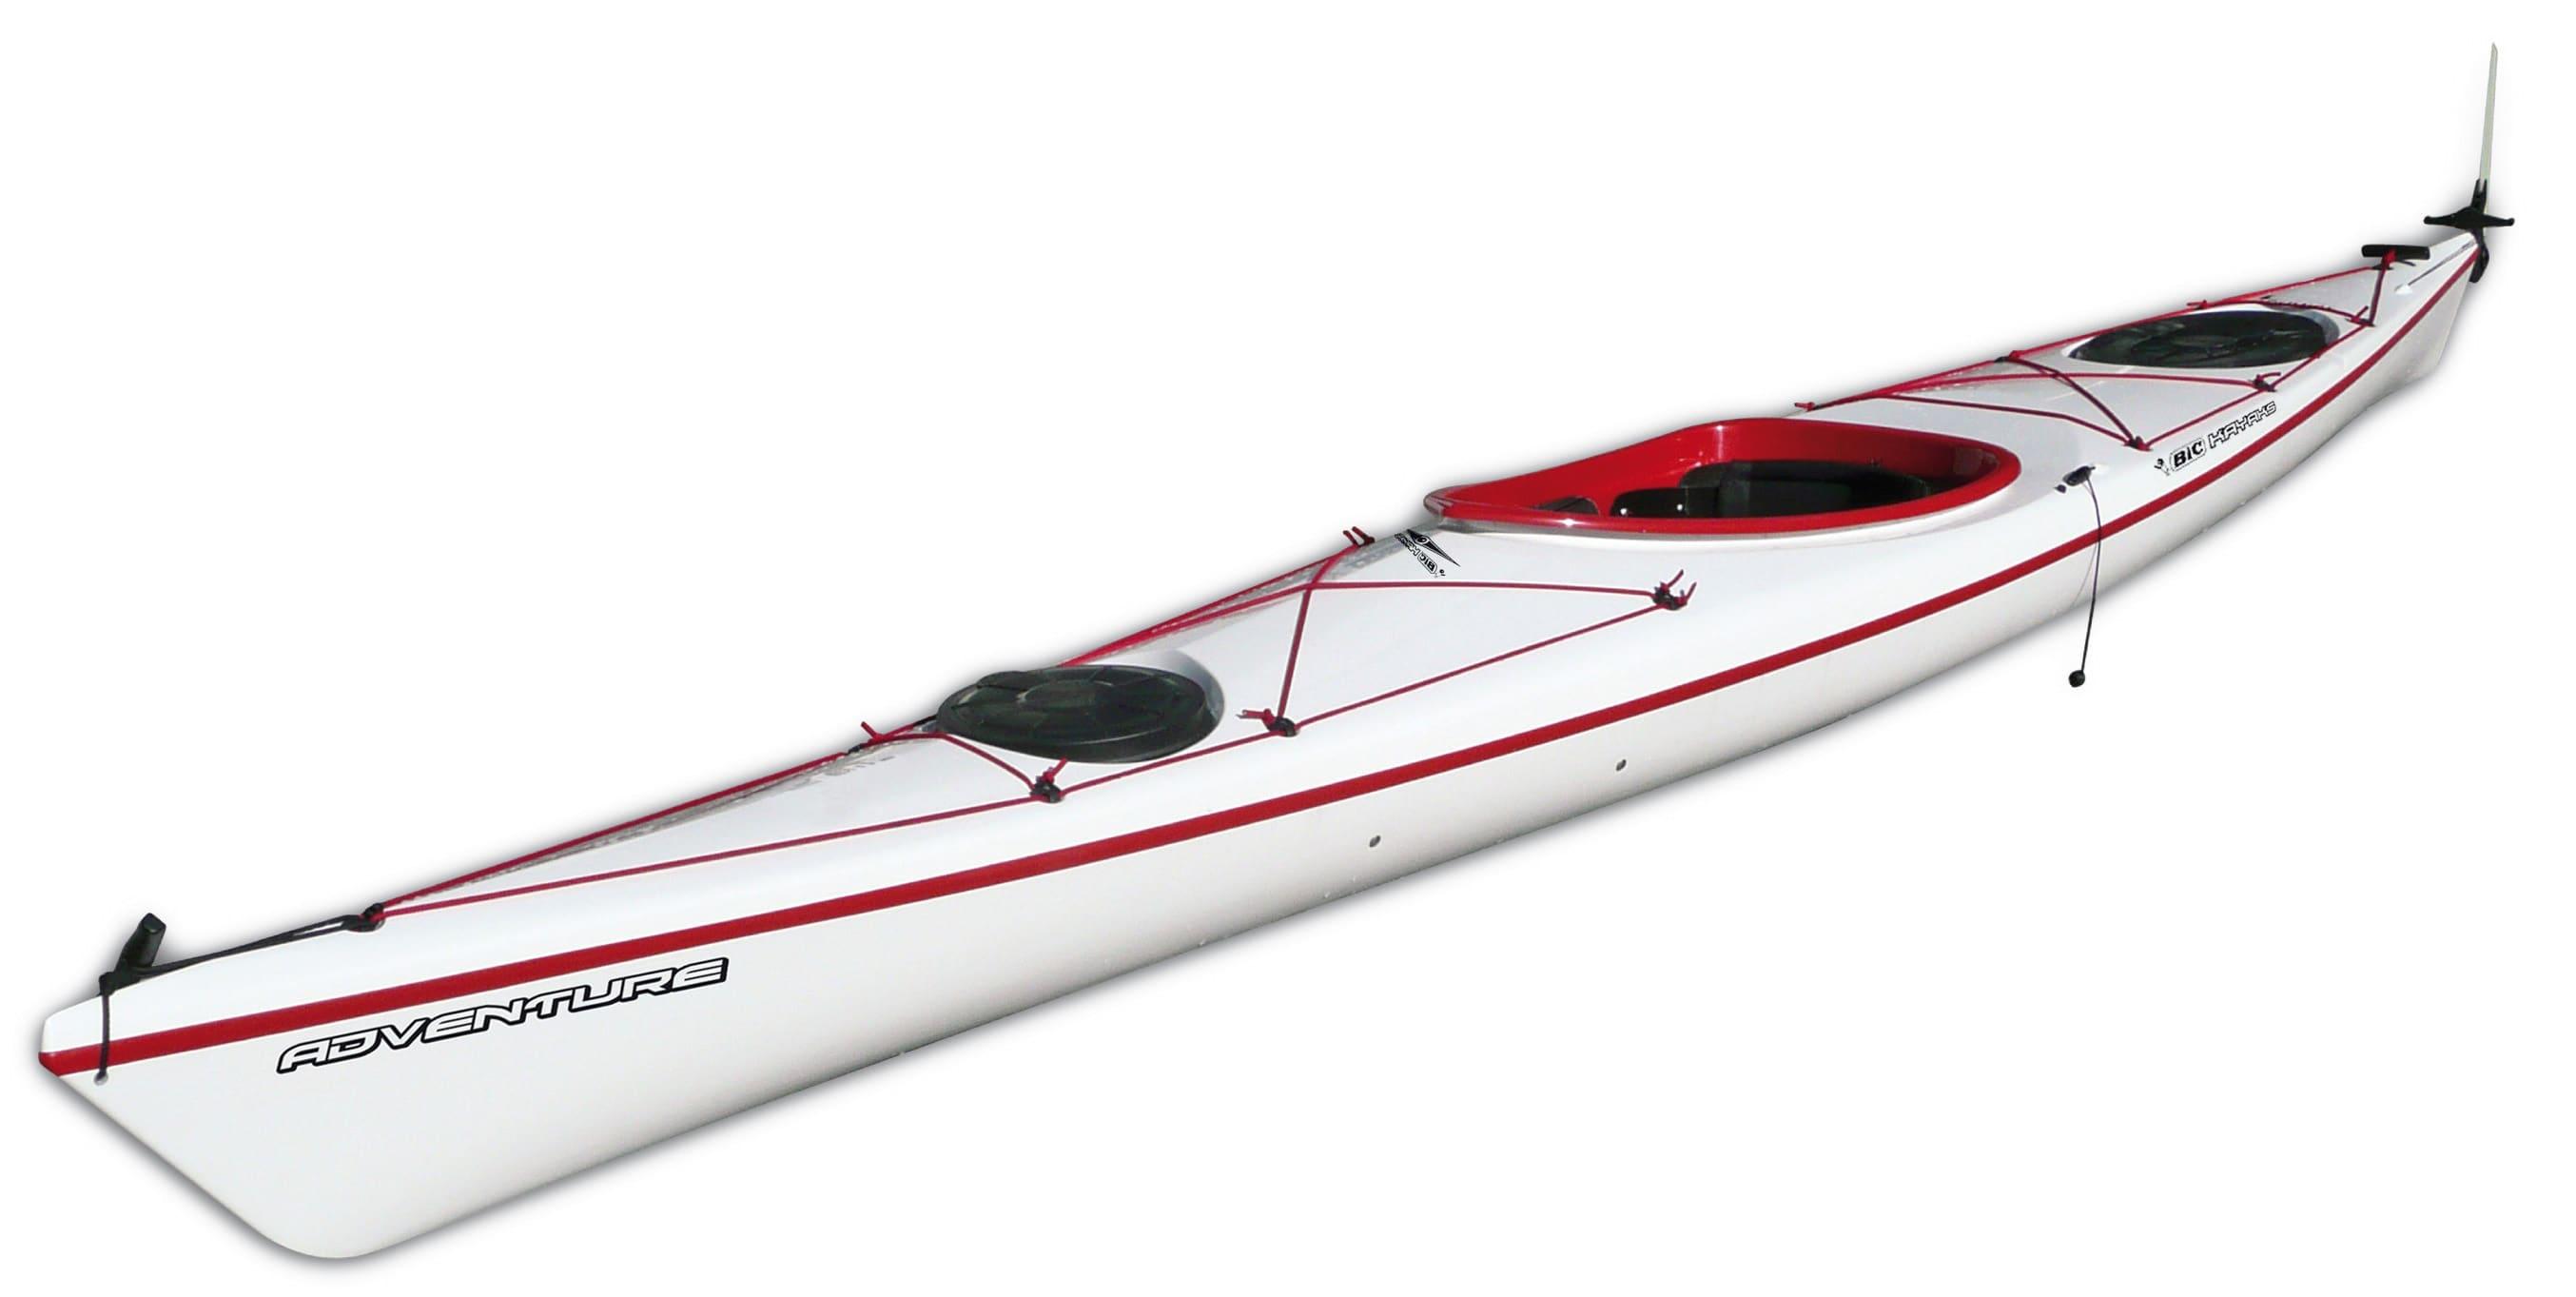 Bic Adventure 150 Kayak